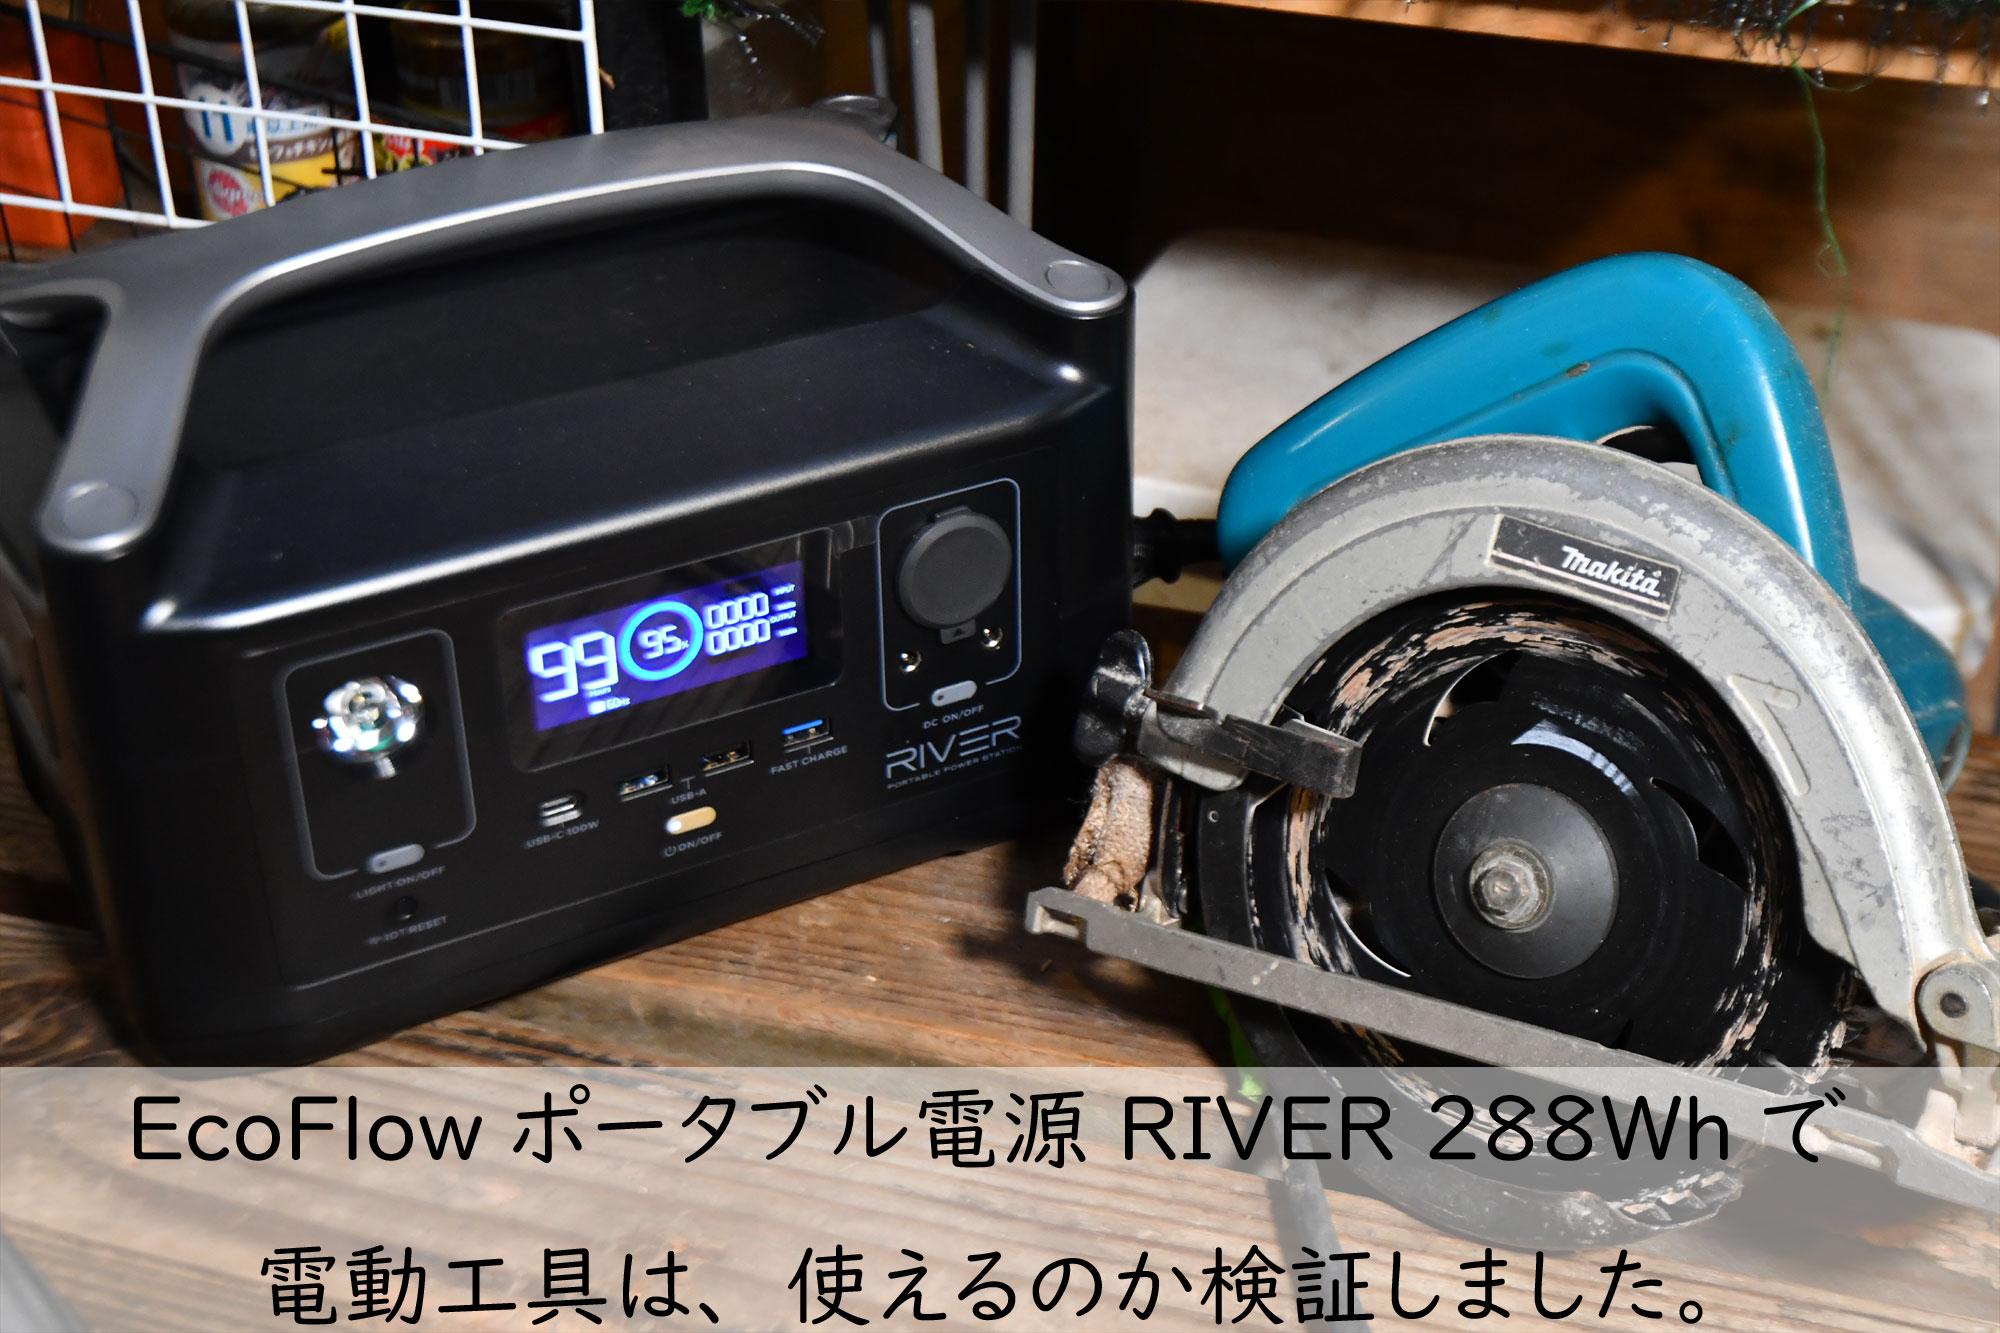 EcoFlow(エコフロー)RIVER 600(288Wh) ポータブル電源で電動工具は、動くのか?検証してみました。